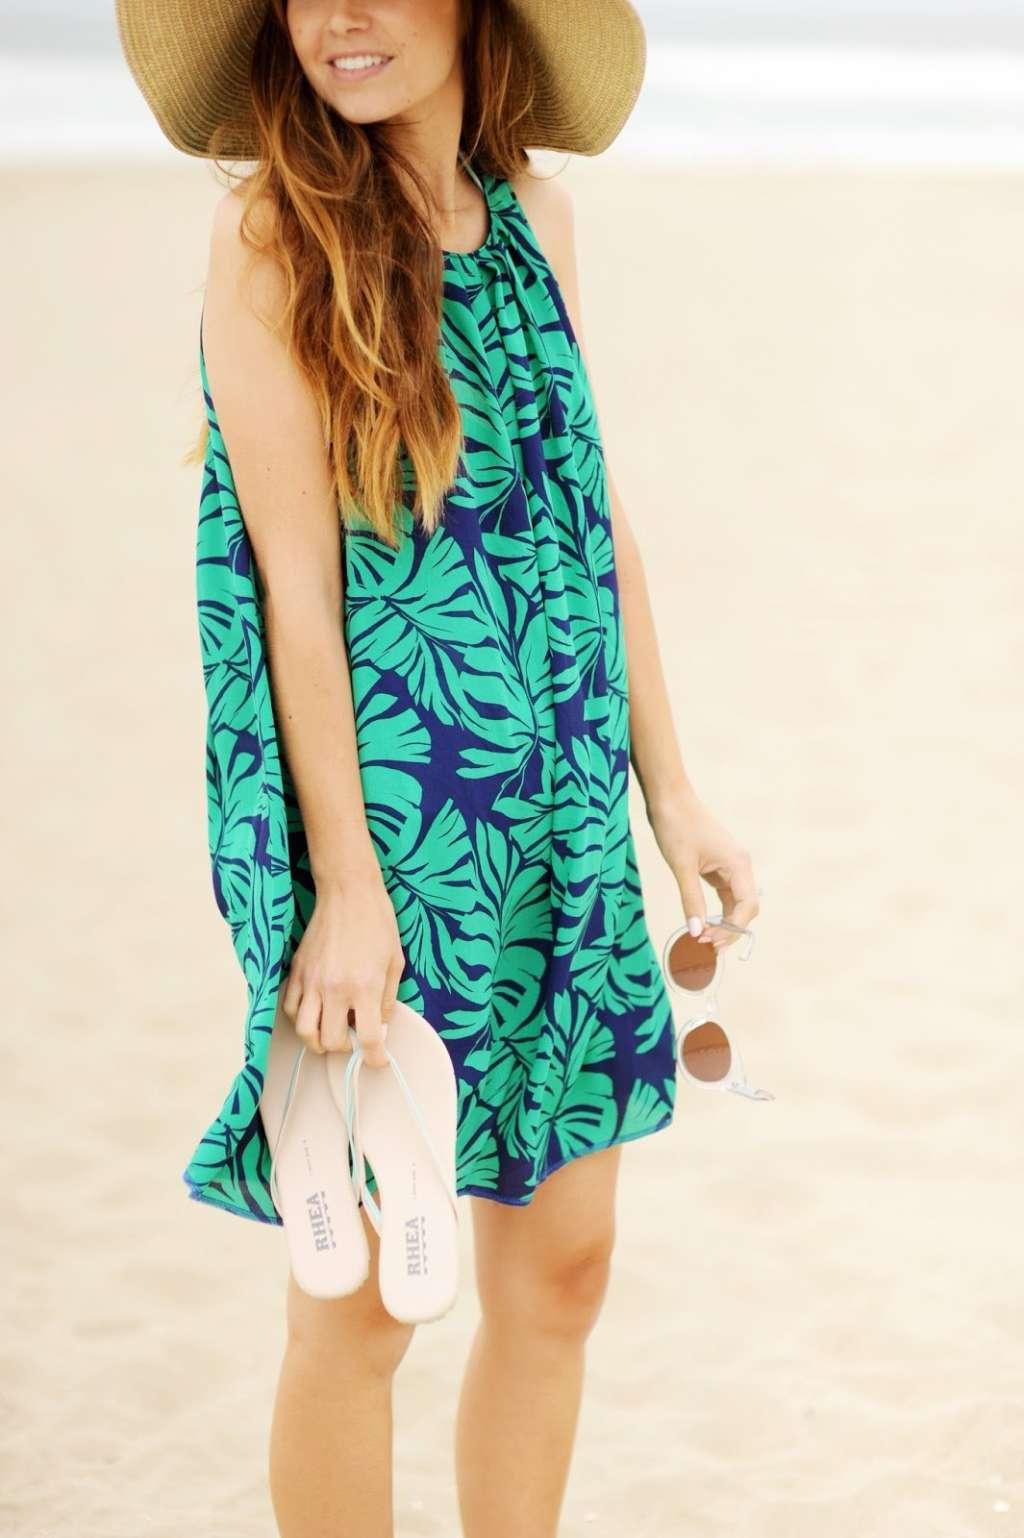 Cute Summer Dresses You Can DIY